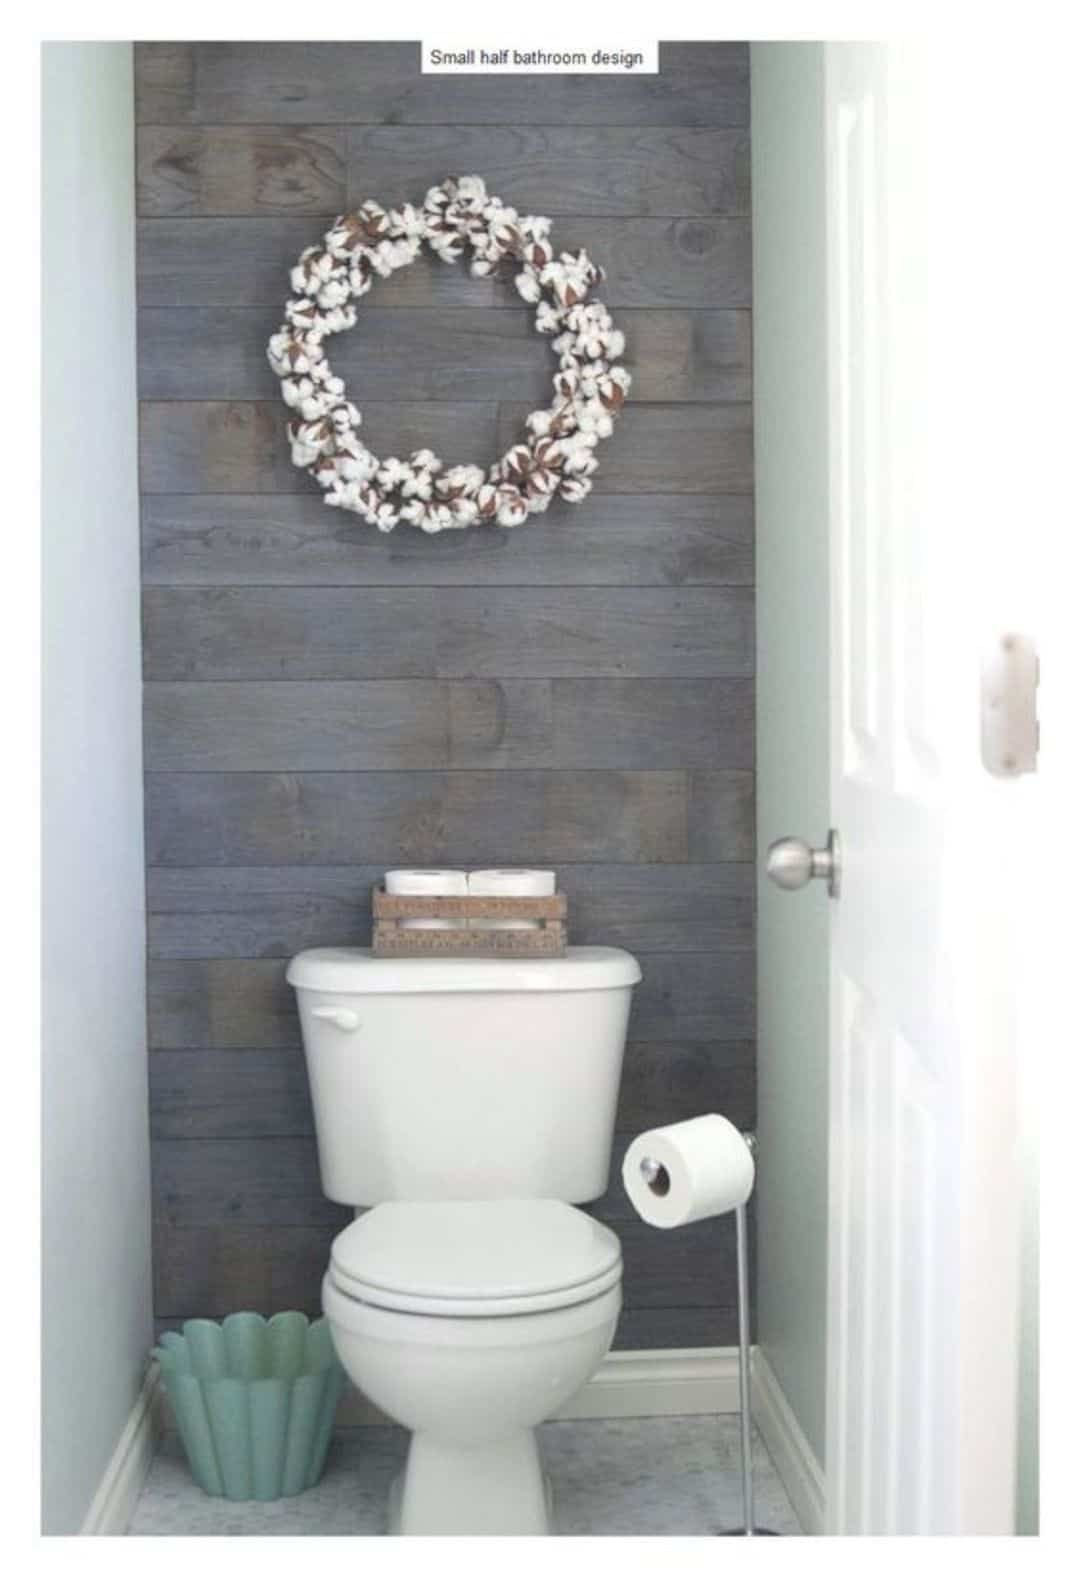 17 Awesome Small Bathroom Decorating Ideas Half Bathroom Decor